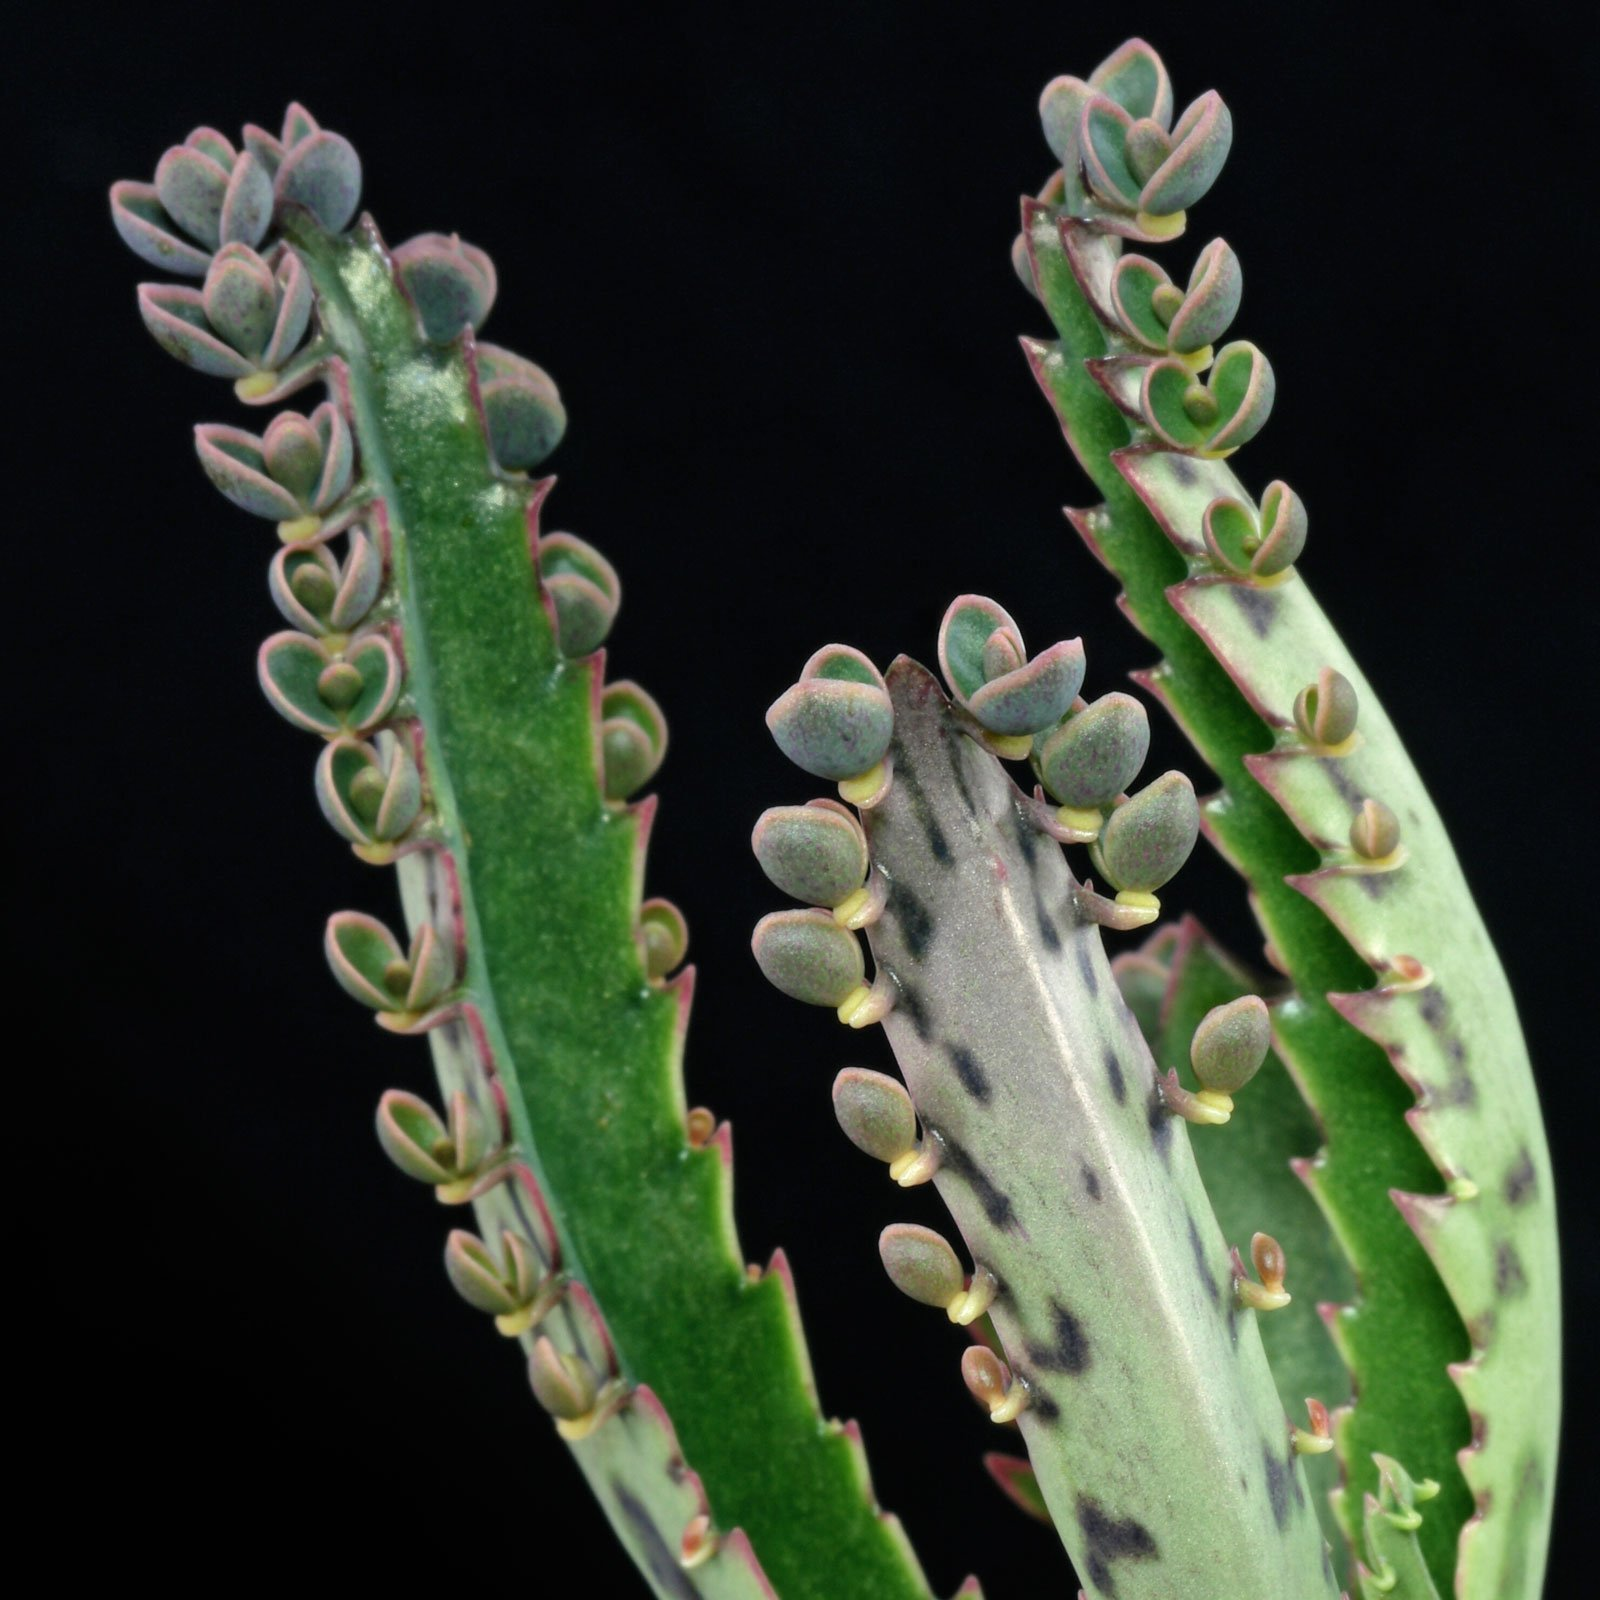 Kalanchoe daigremontiana